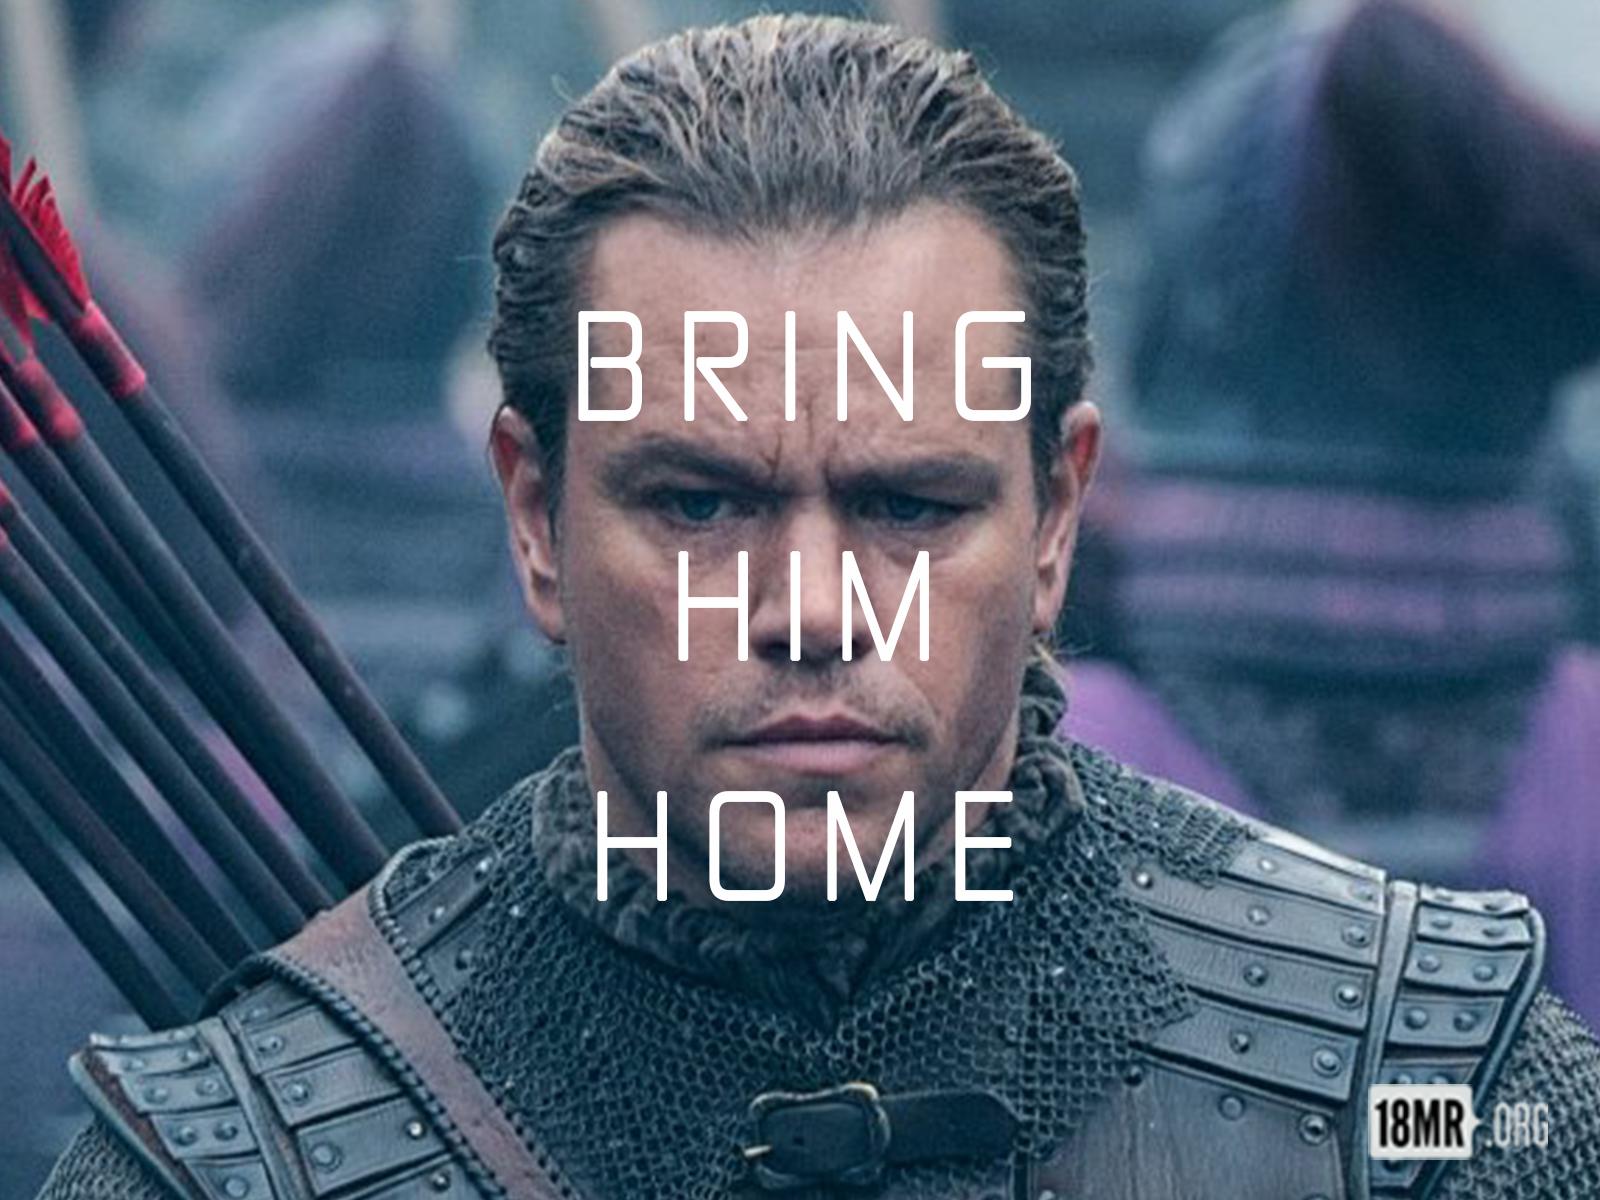 Chinese Embassy Ban Matt Damon BringHimHome